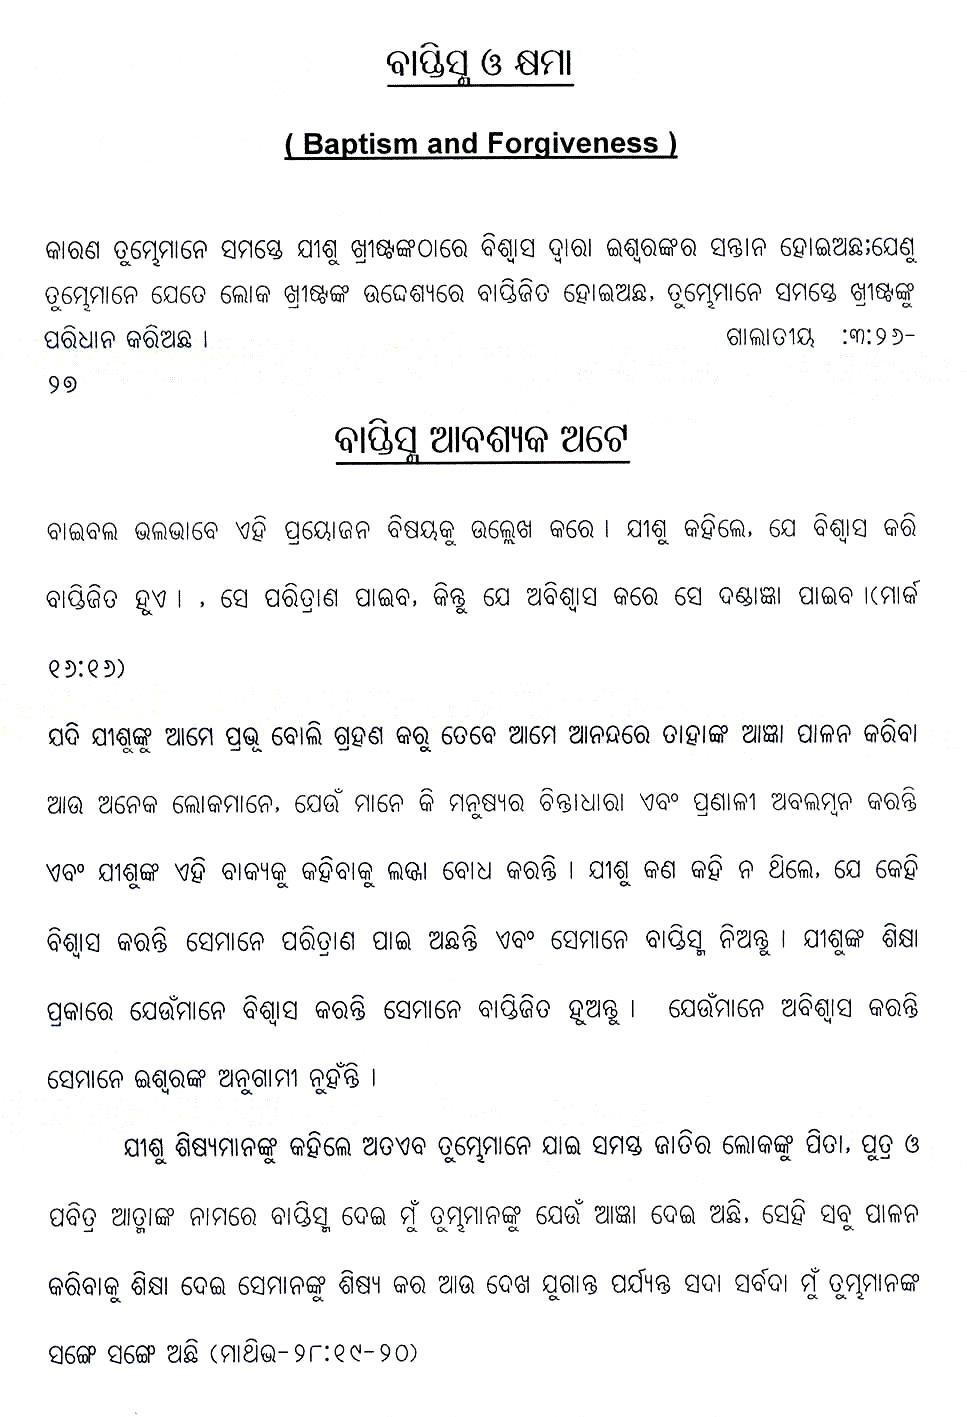 words of life in oriya language baptism and forgiveness